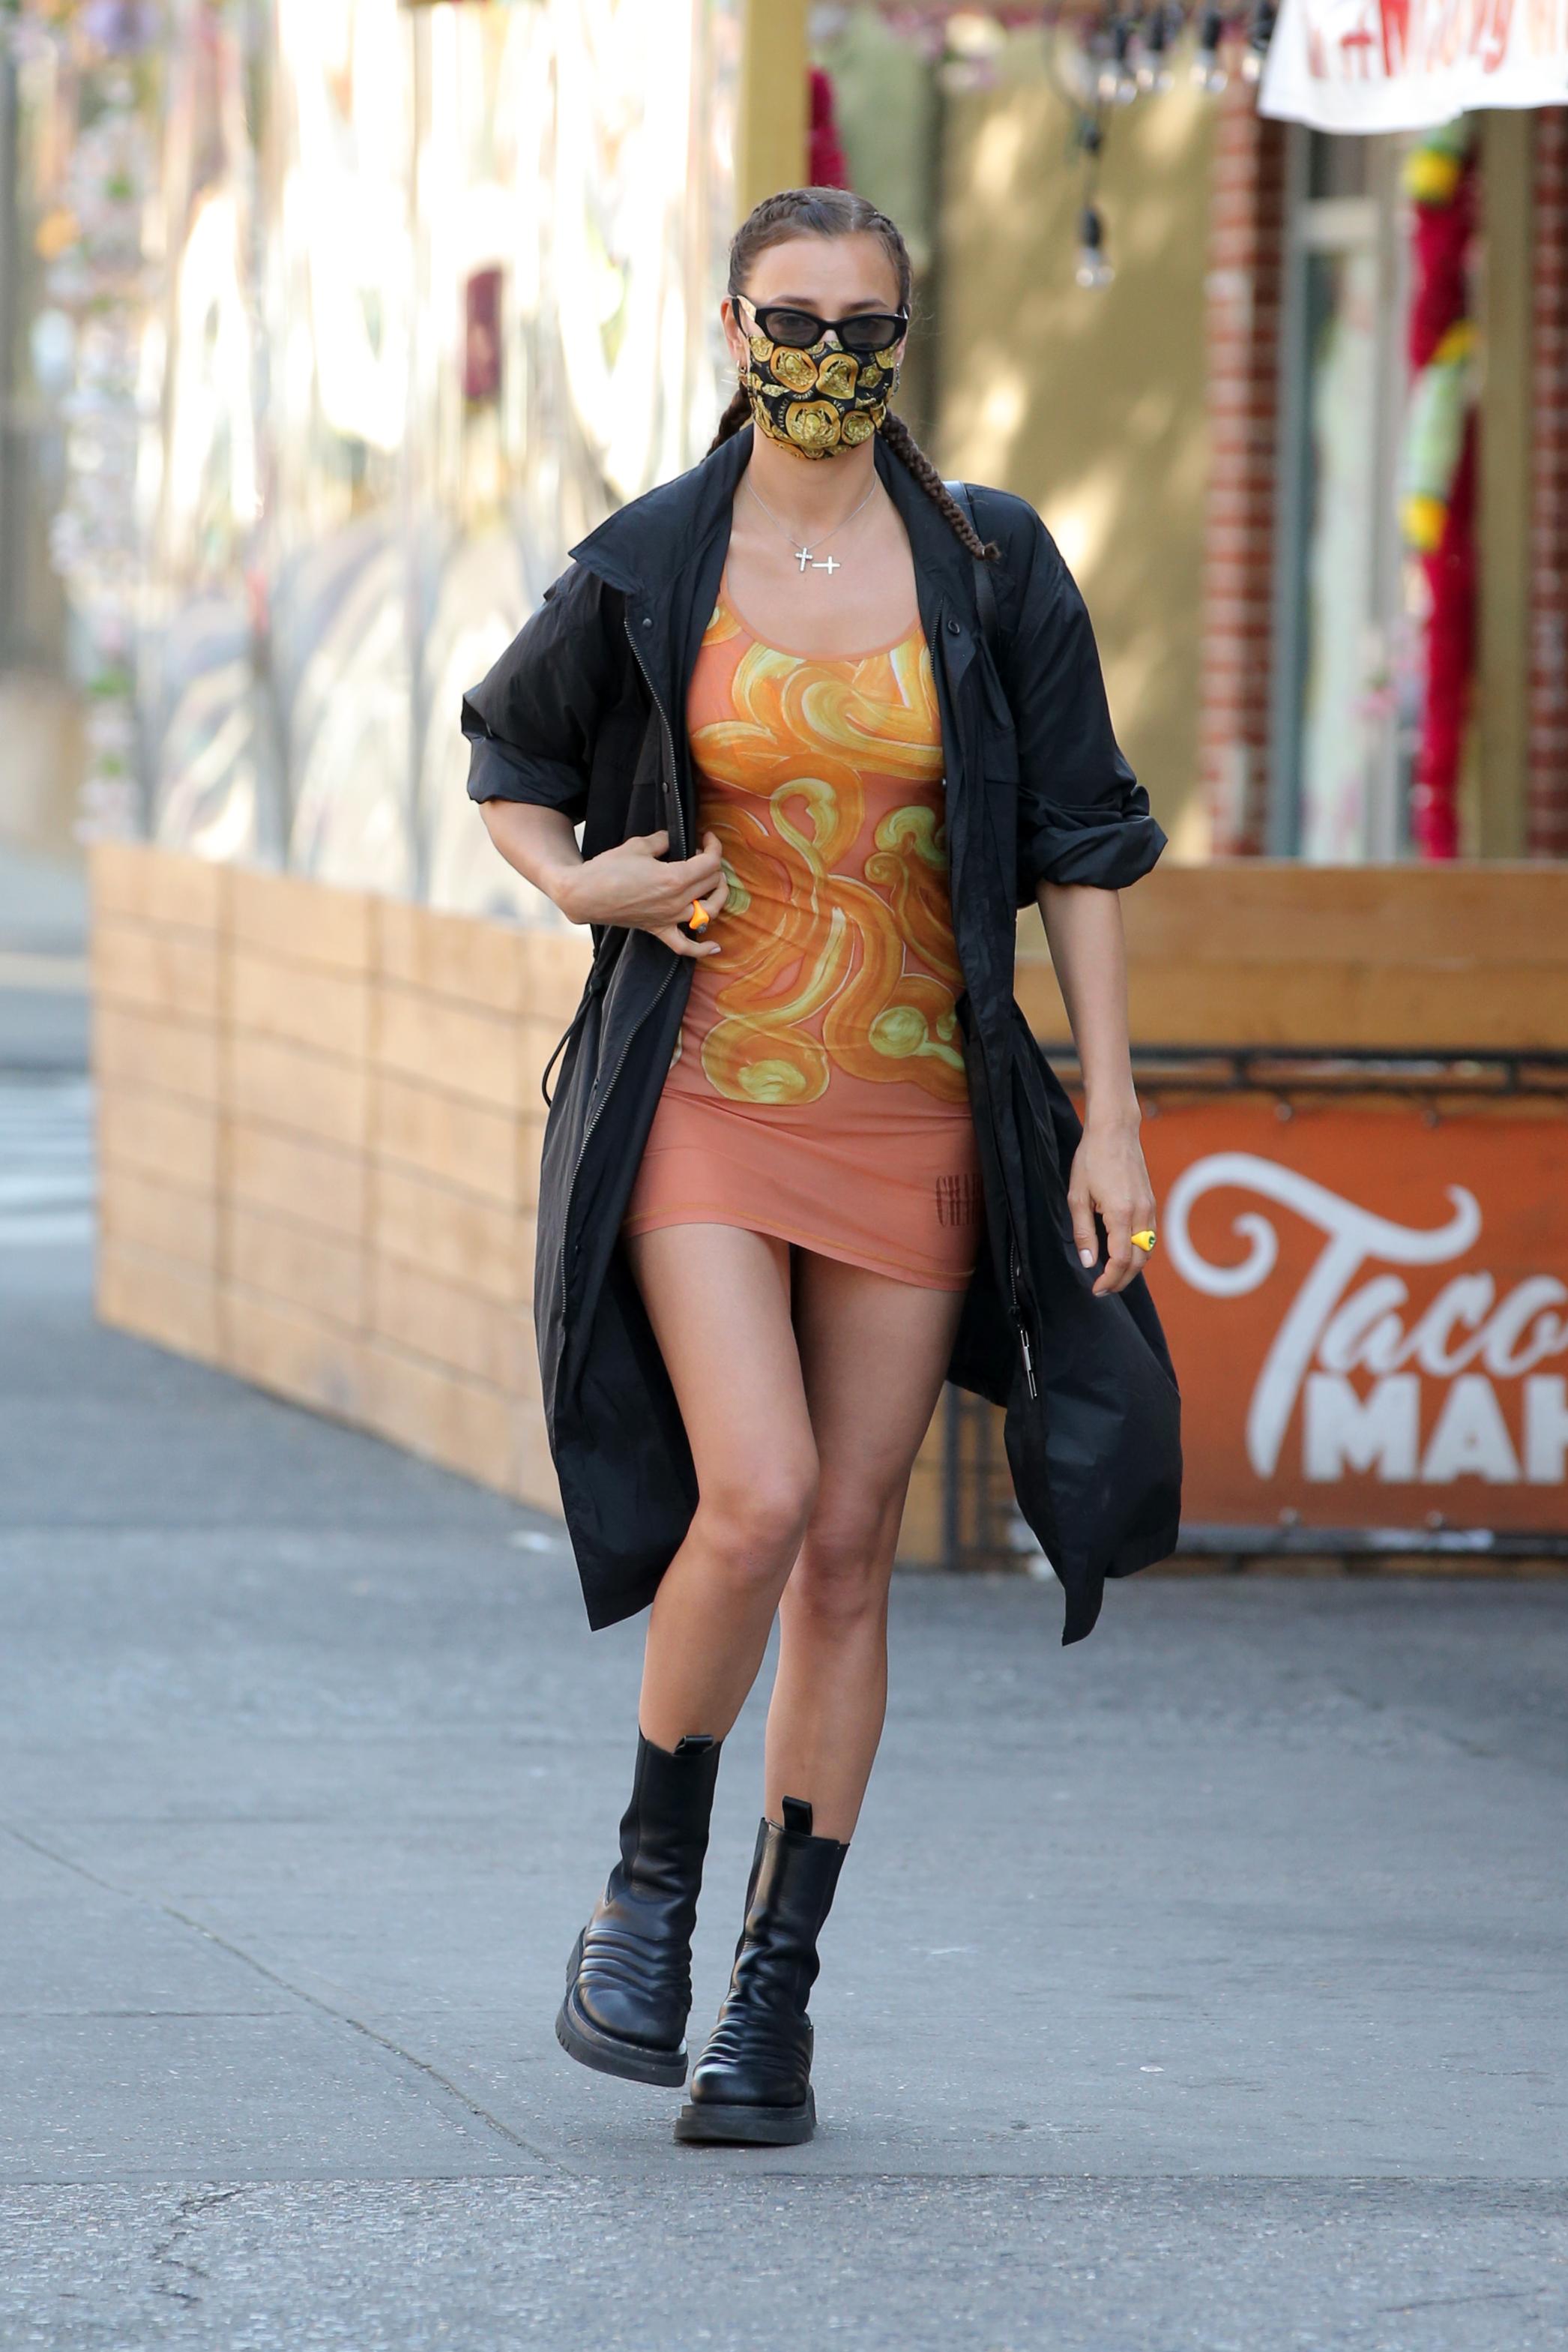 Irina Shayk, Charlotte Knowles orange dress, versace face mask, Bottega Veneta boots, trench coat